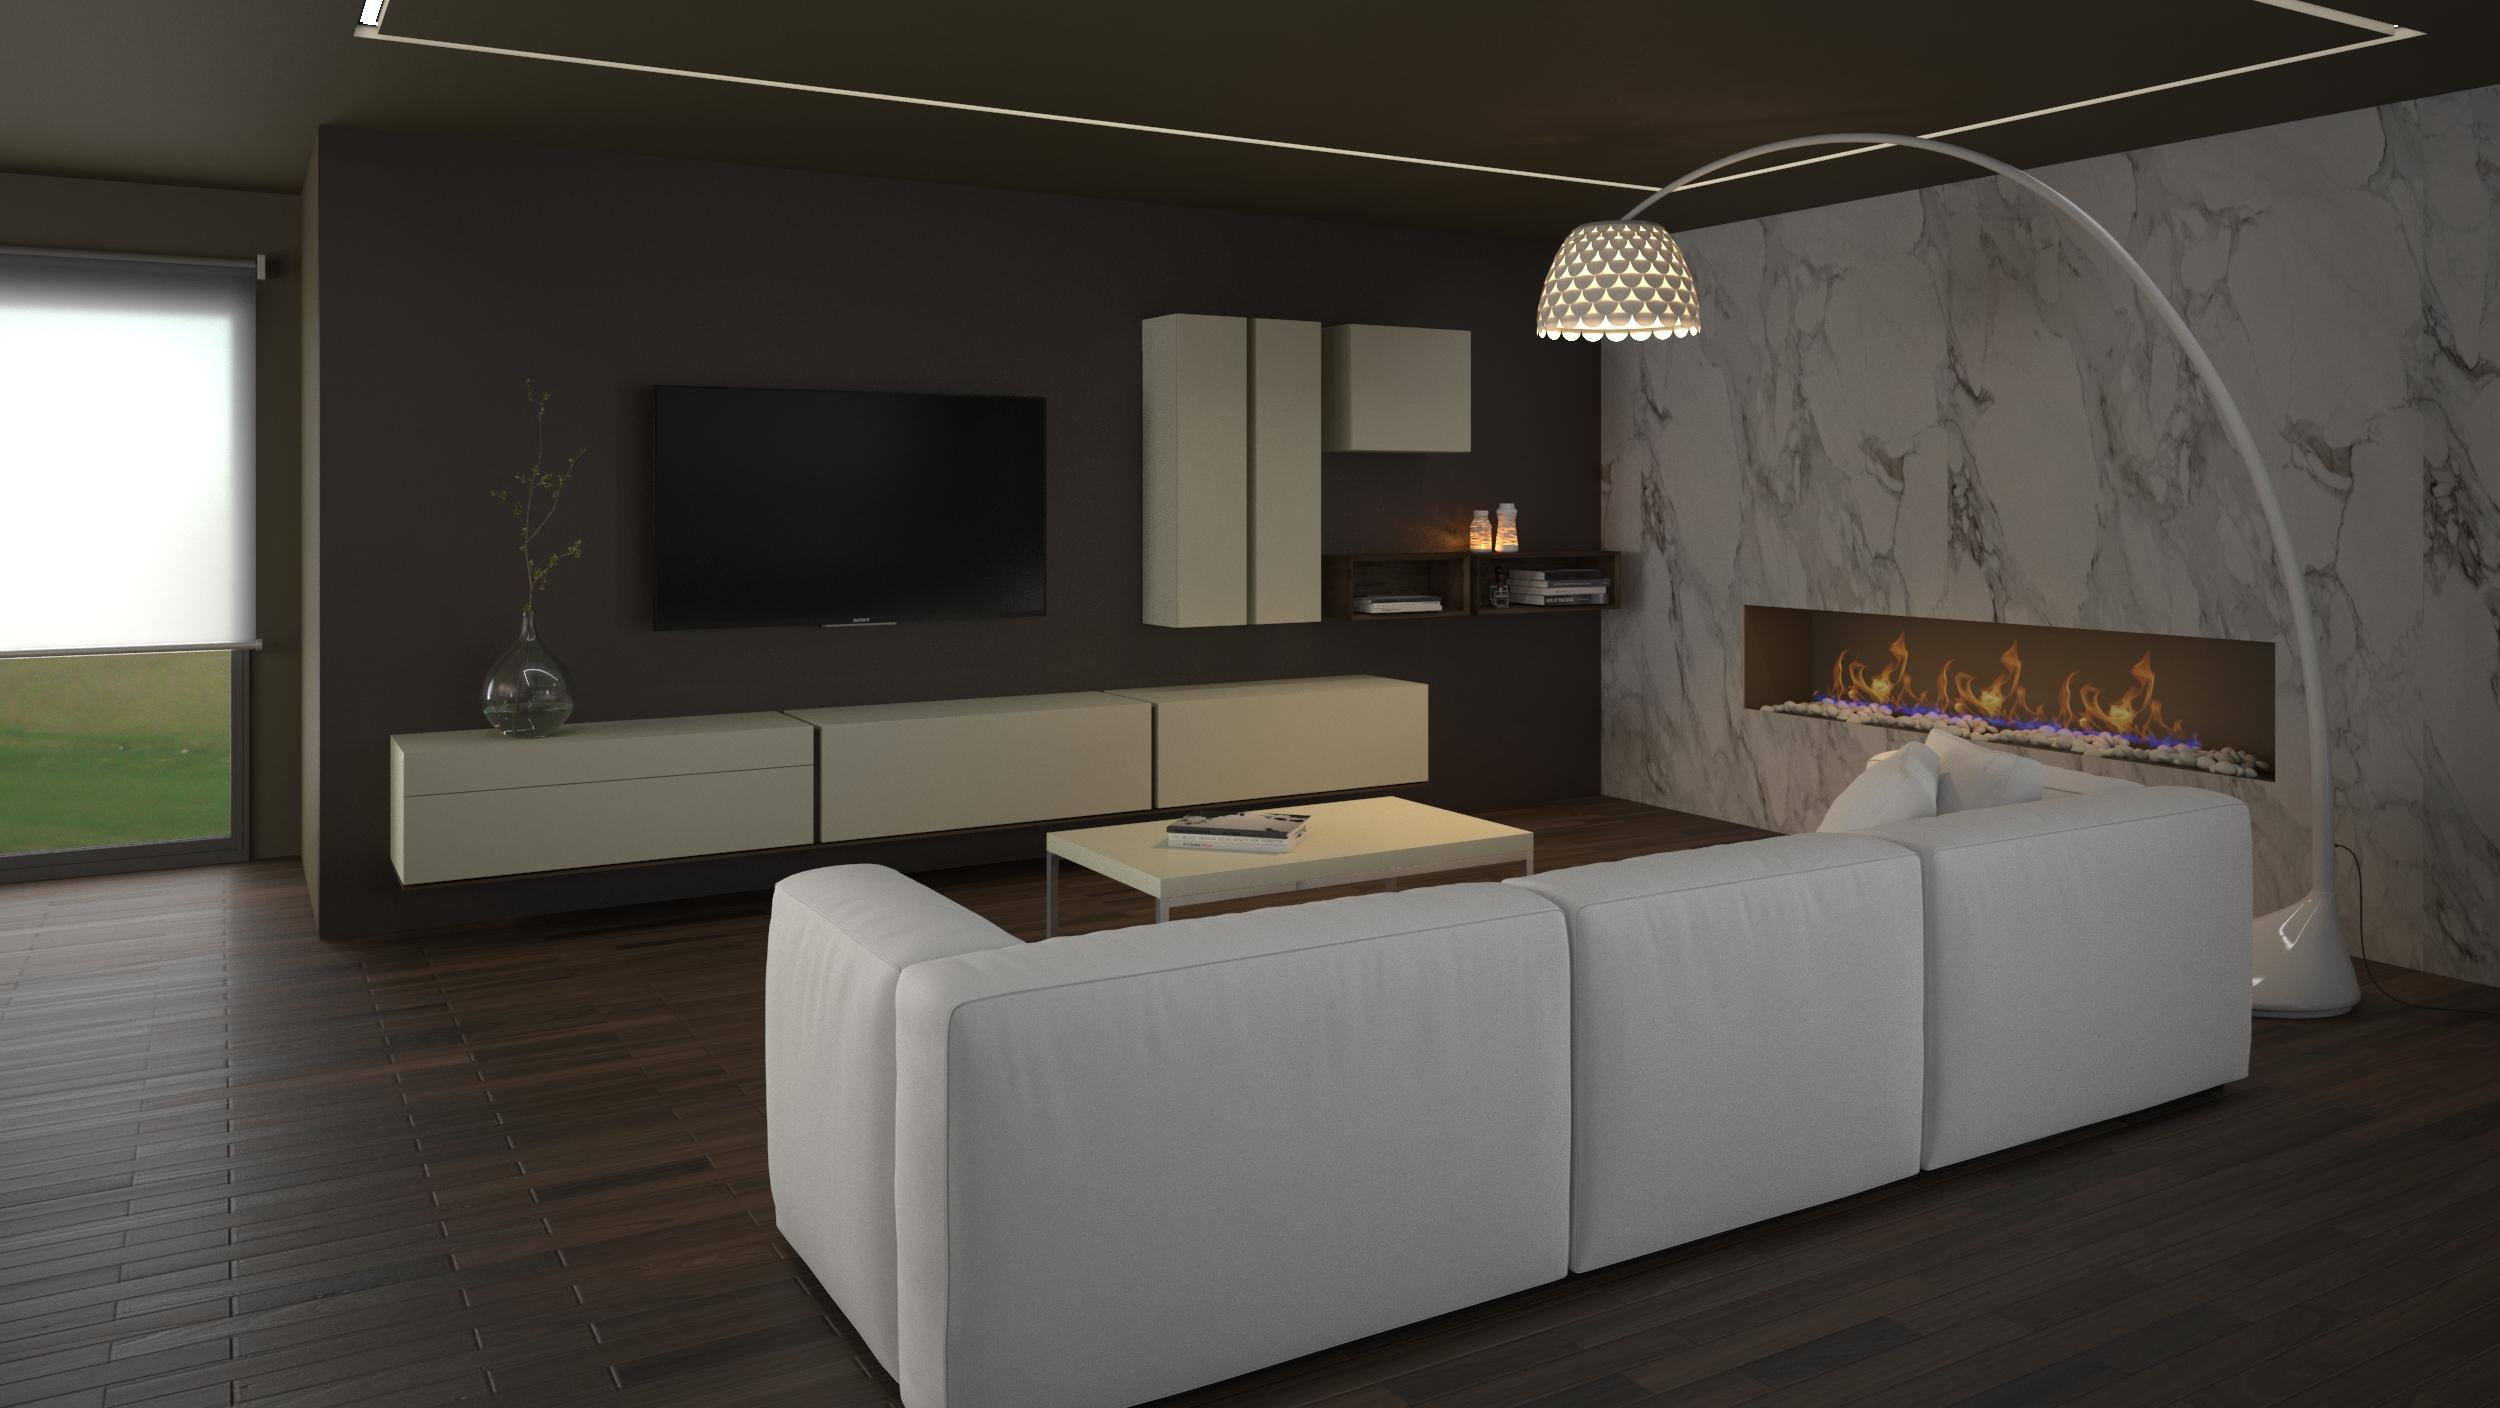 interioristas-interiorismo-decoradores-viviendas-casas-tendencias-valencia-3